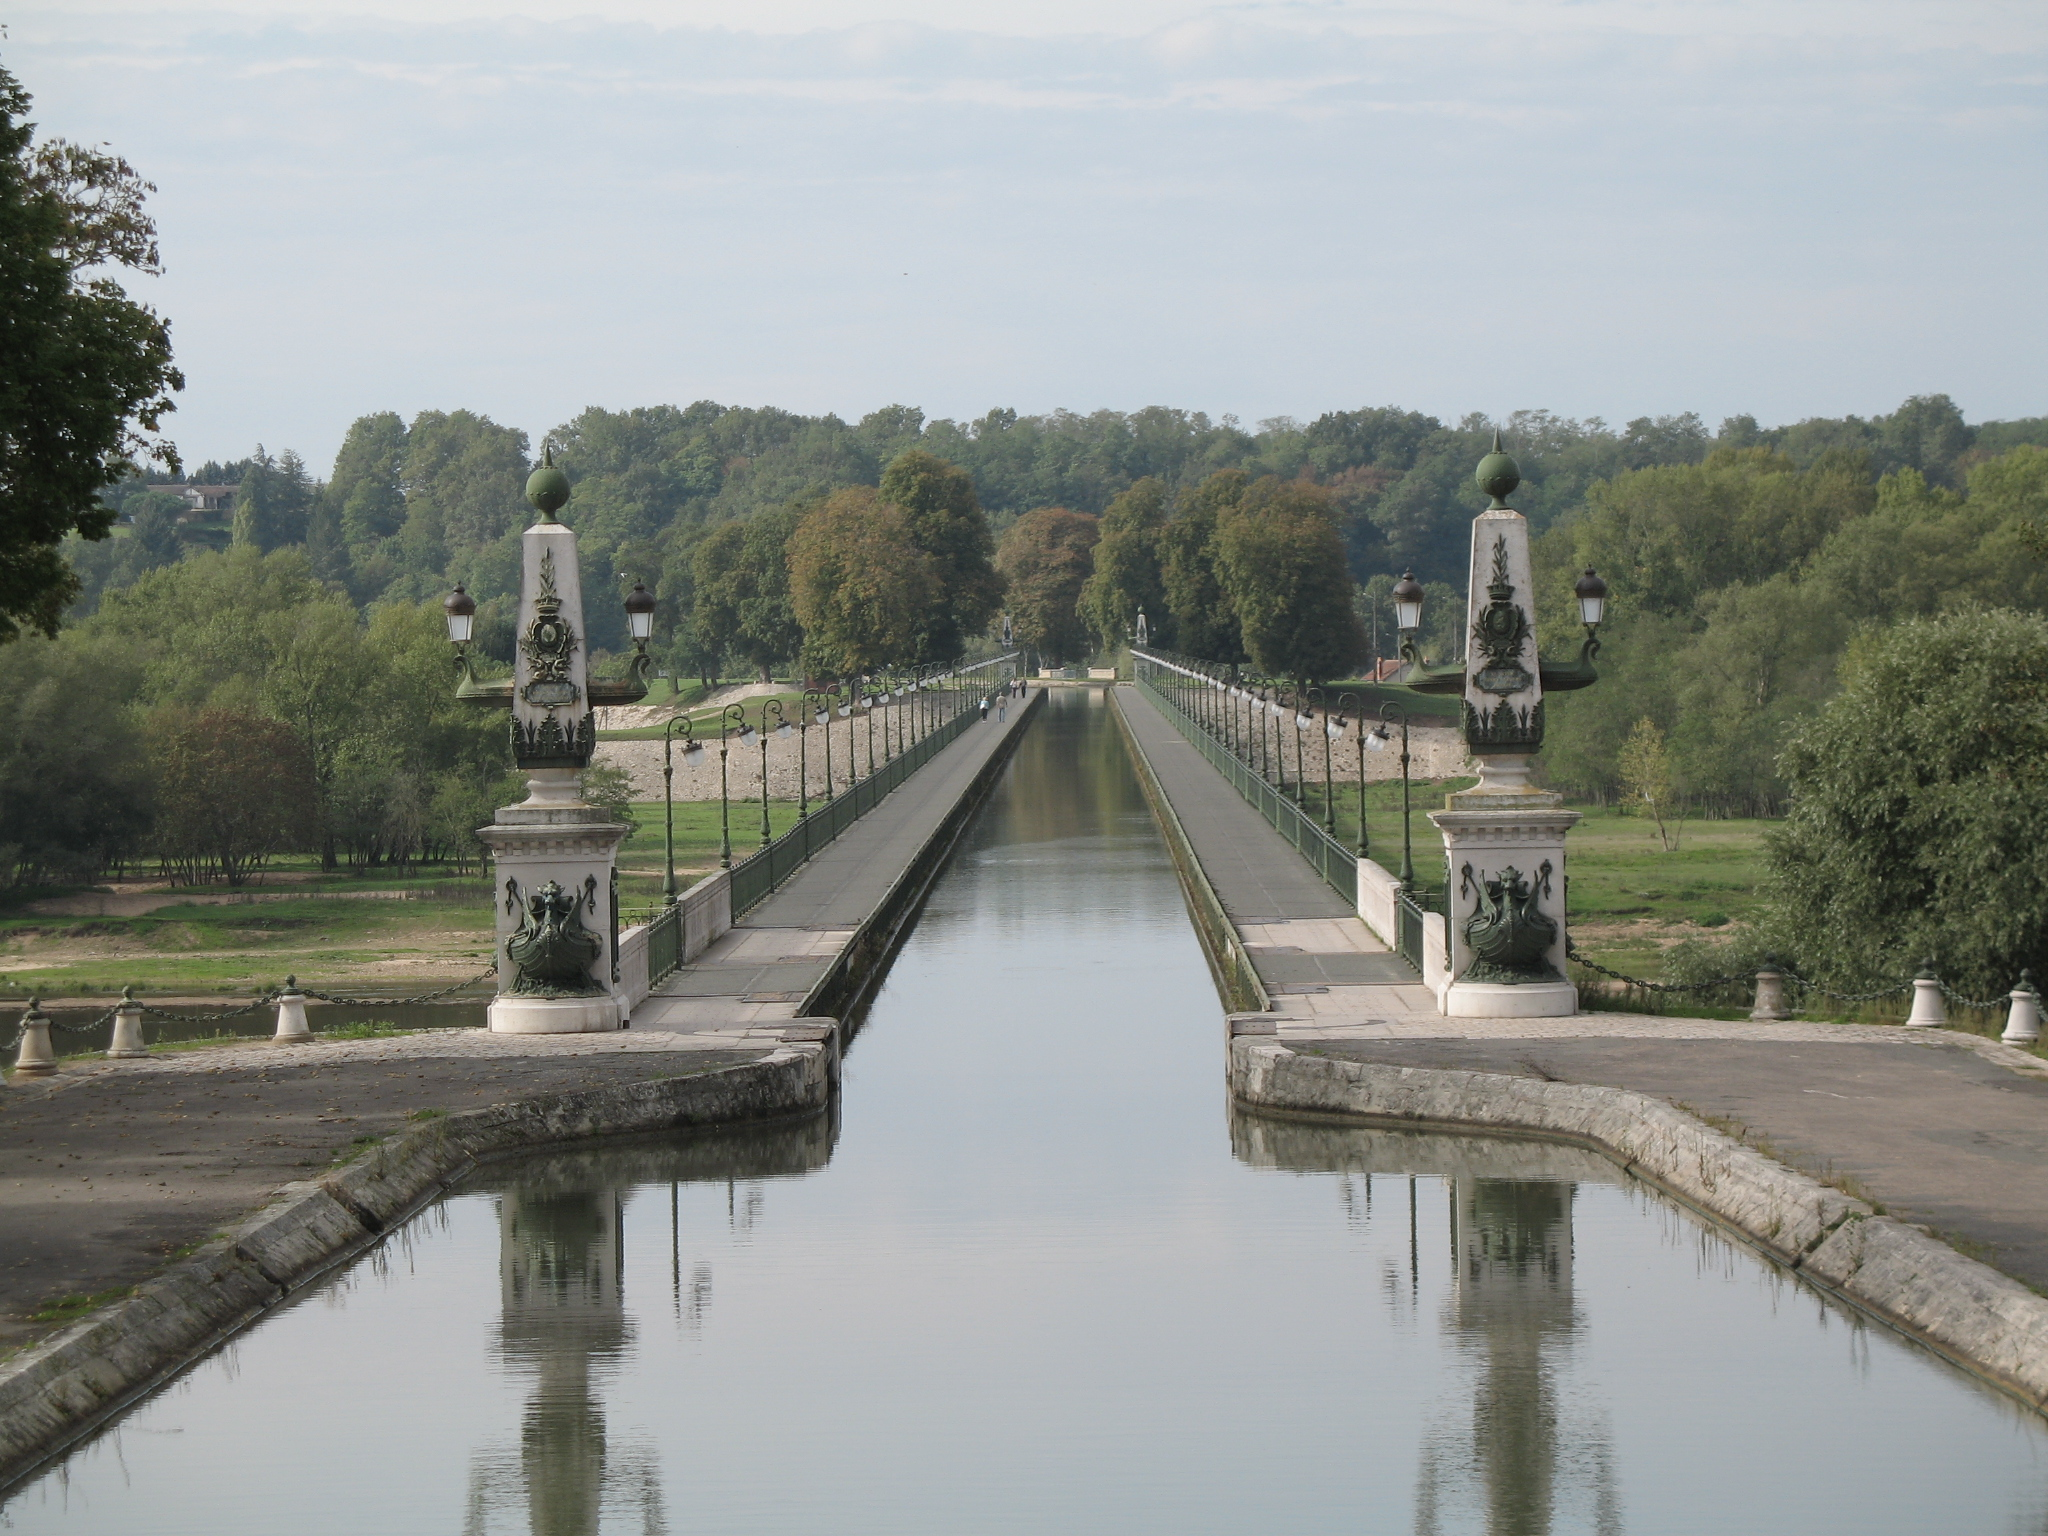 Fitxer pont canal de viquip dia l for Carreaux de briare